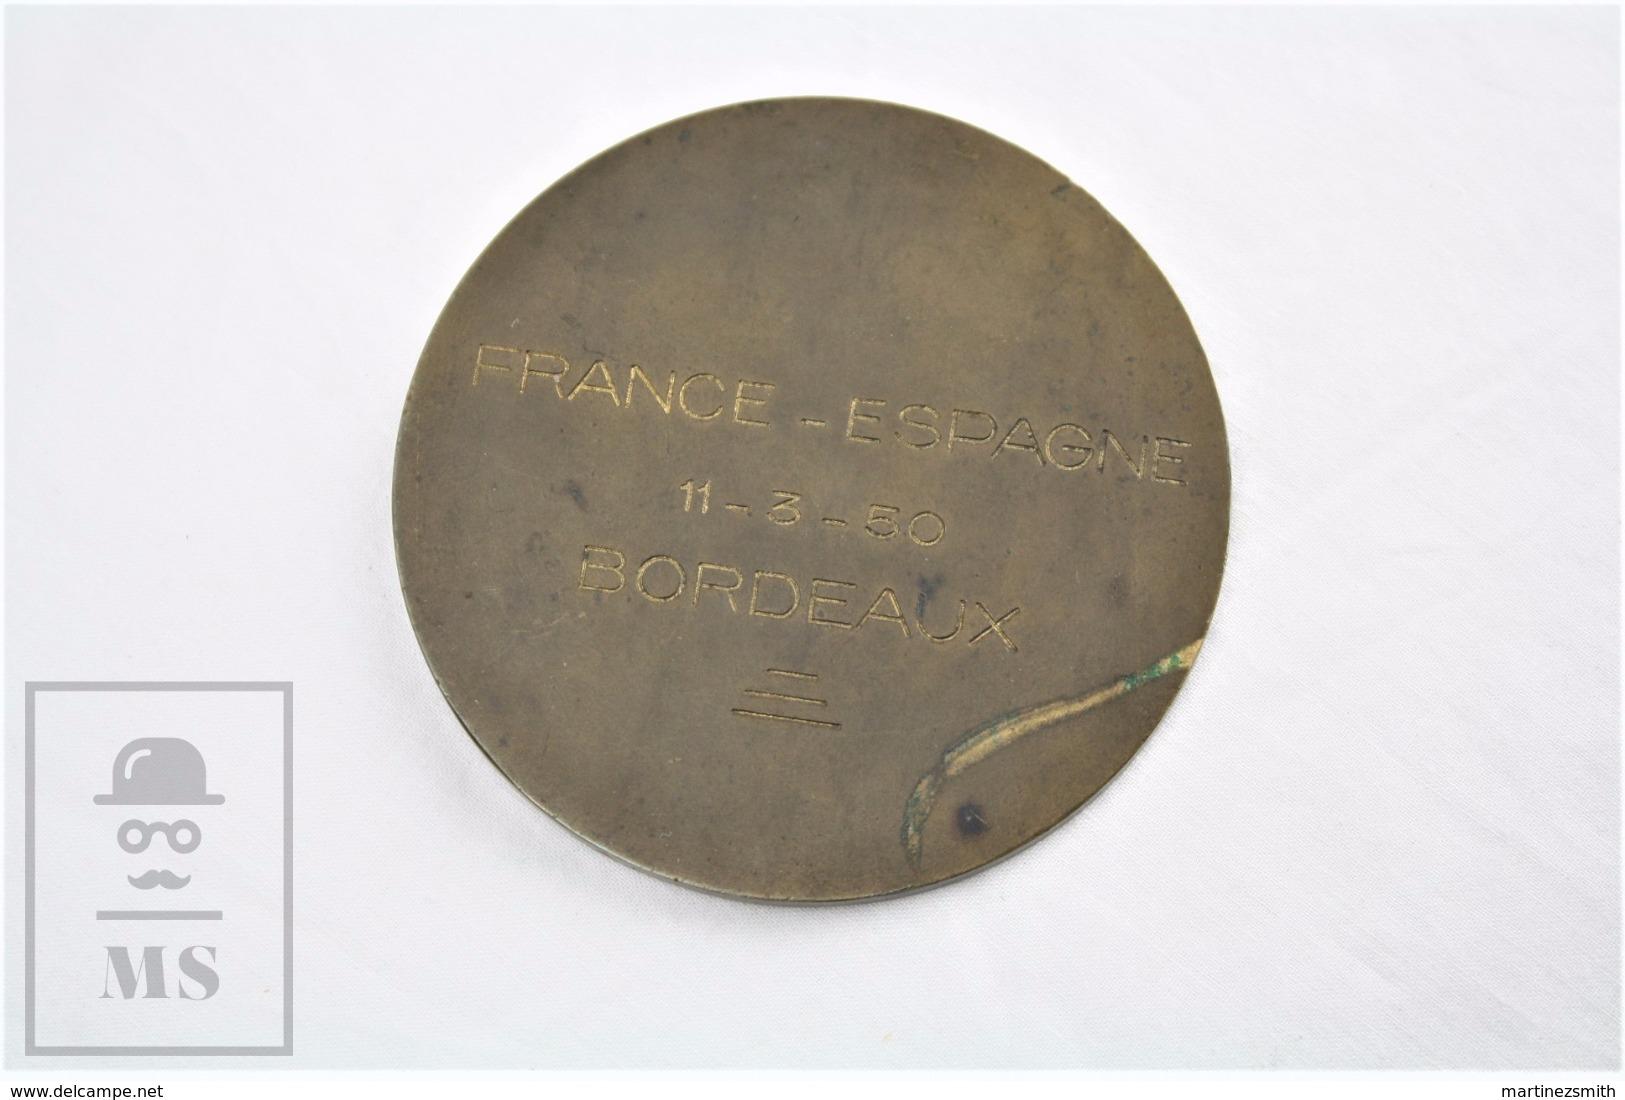 Federation Française De Handball - French Handball Federation Medal - France - Spain 1950 Match At Bordeaux - Palla A Mano